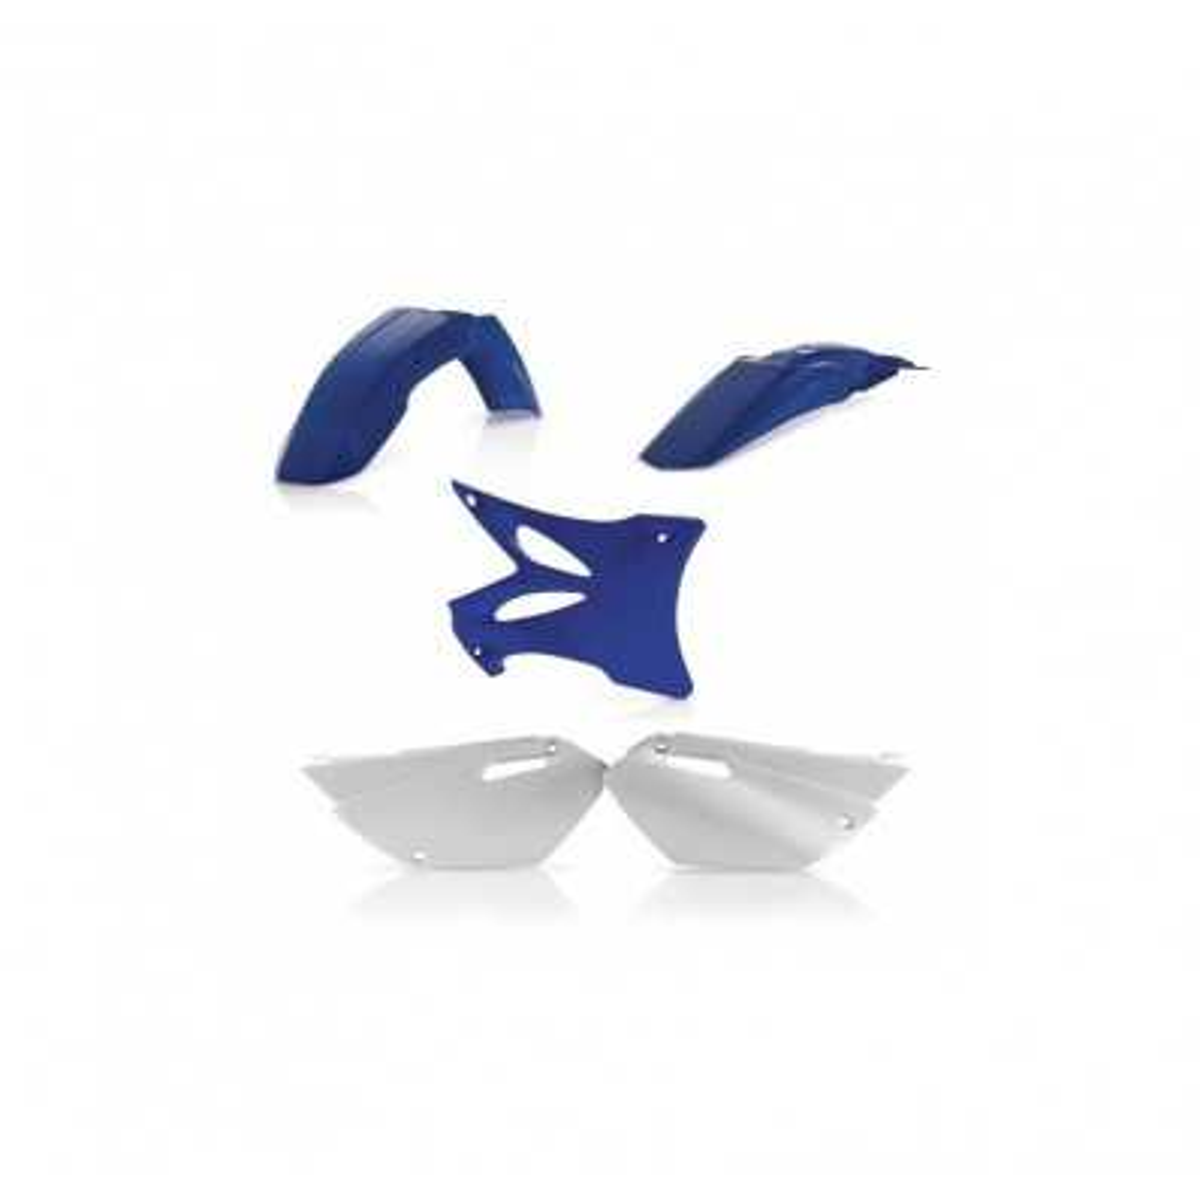 0023086-553 - Kit Plasticos Yz 250 Wr 250 18 Origen